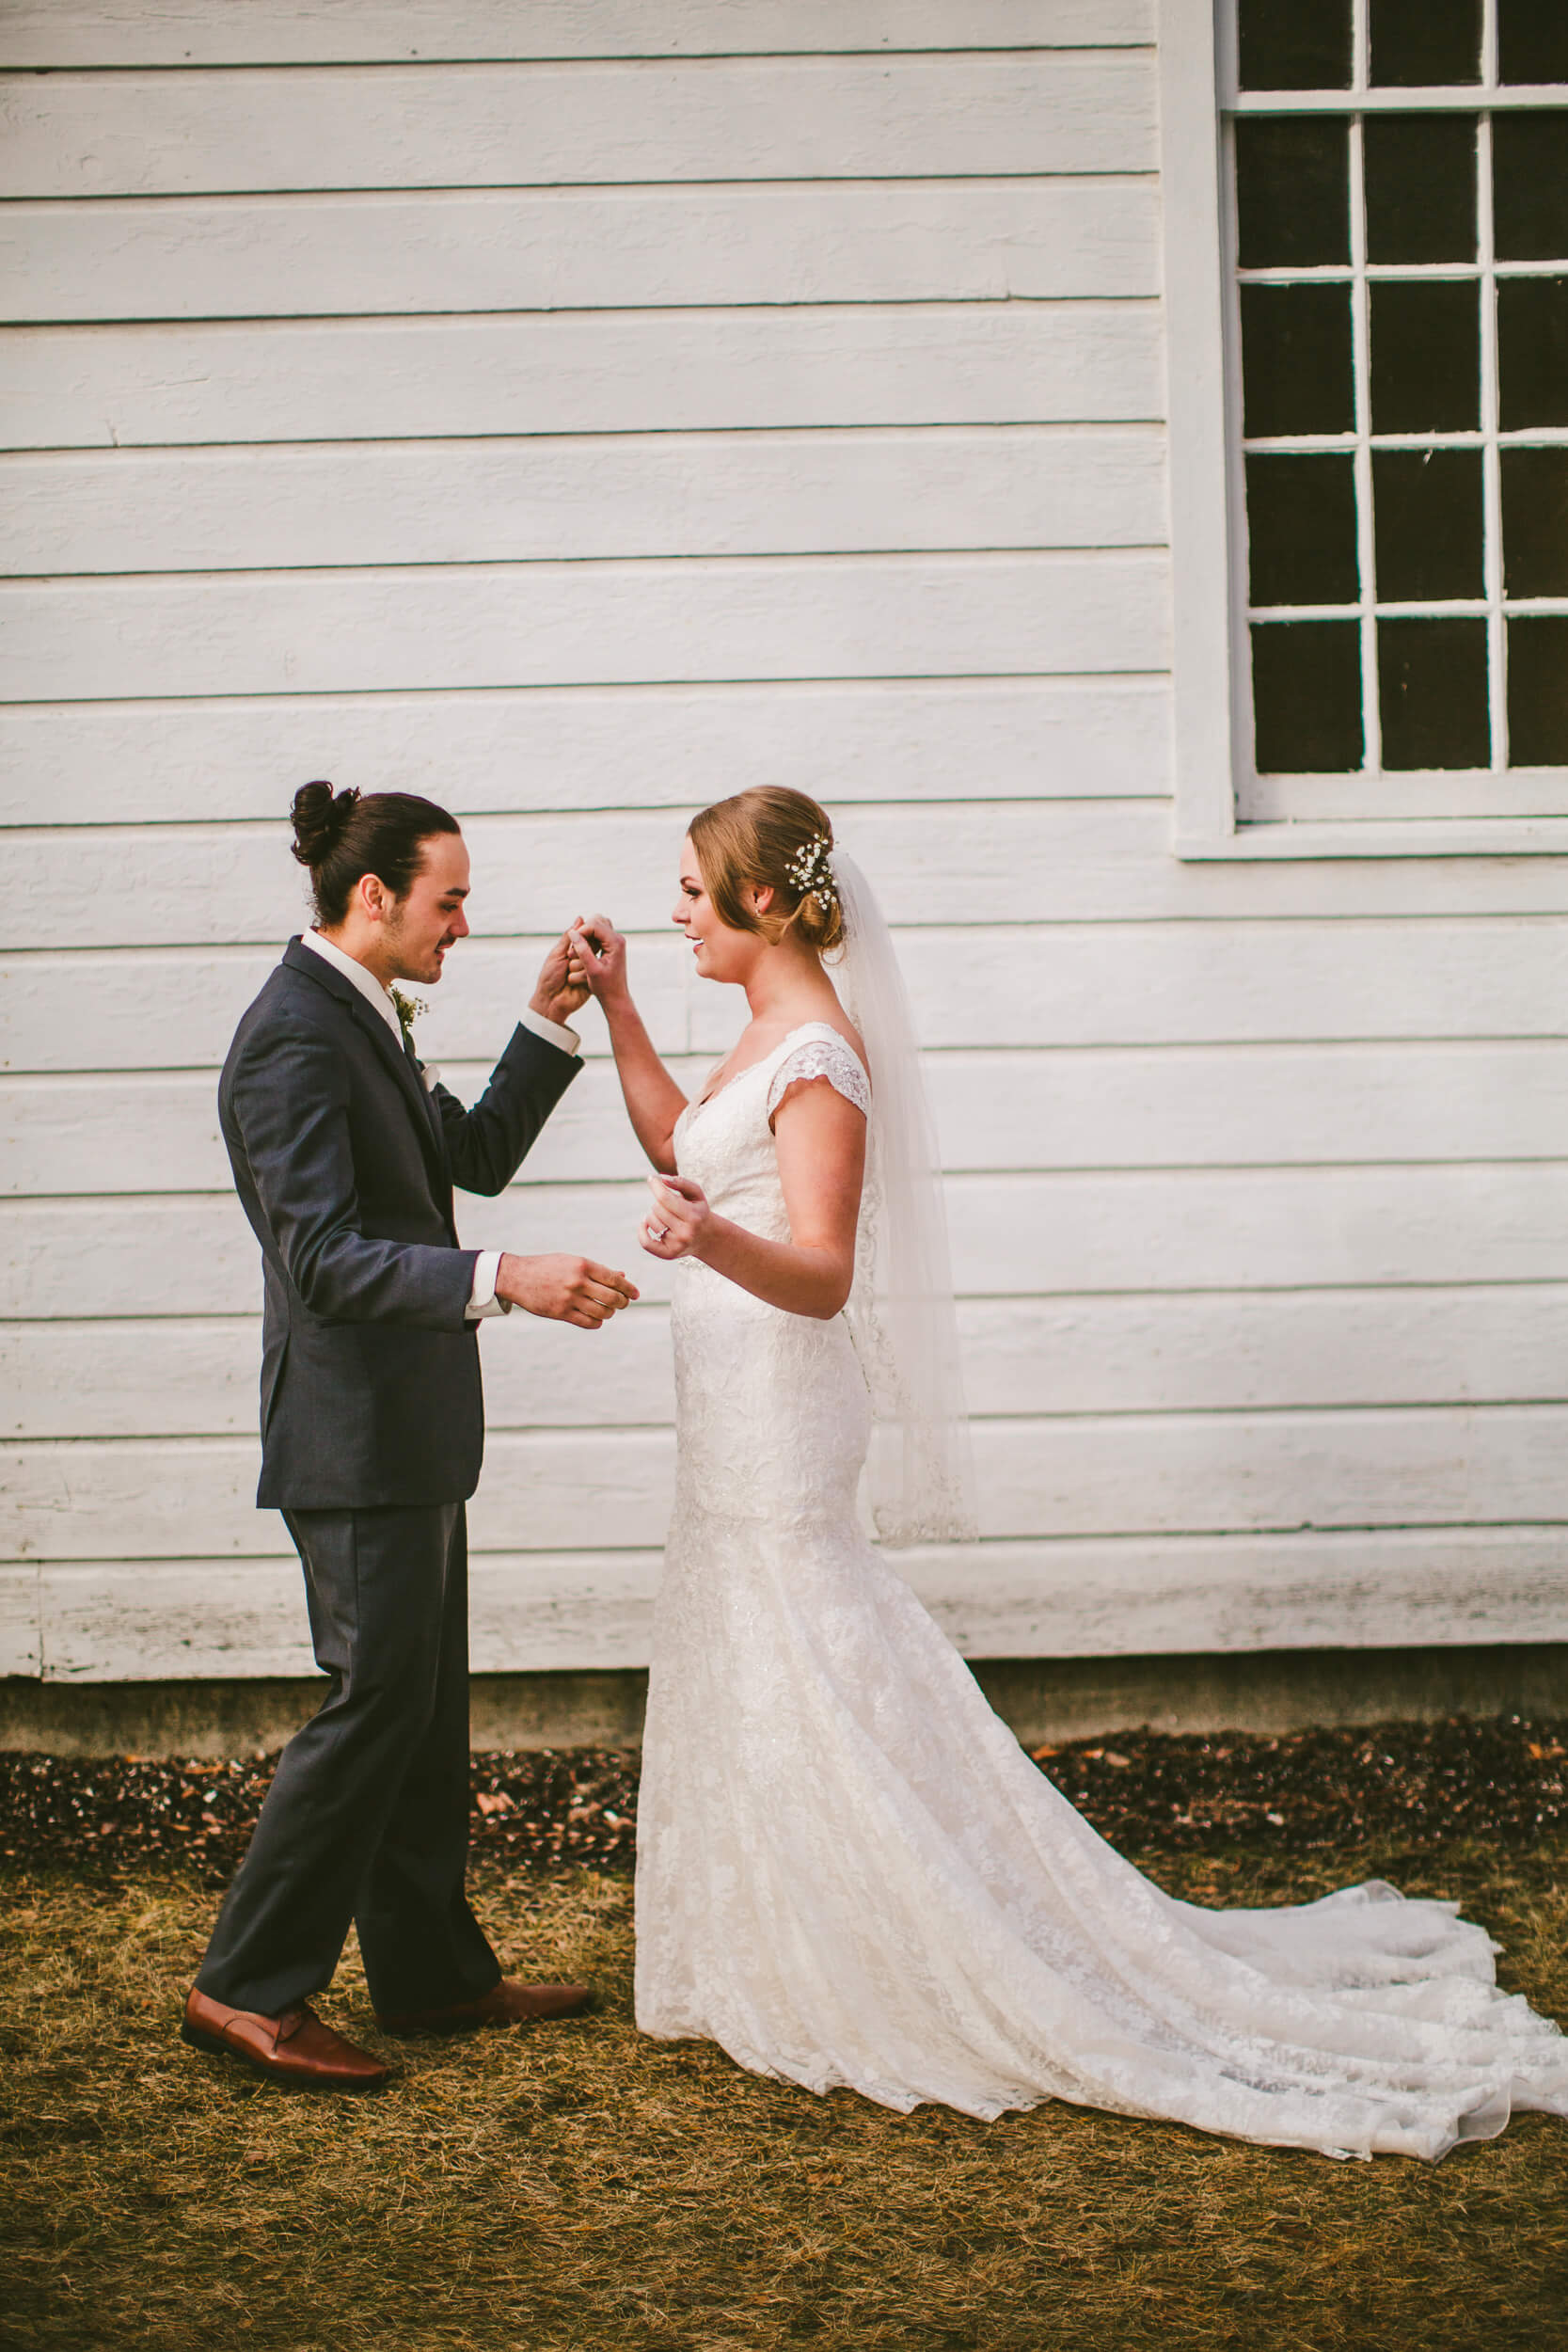 mukogawa winter wedding in spokane (78).jpg